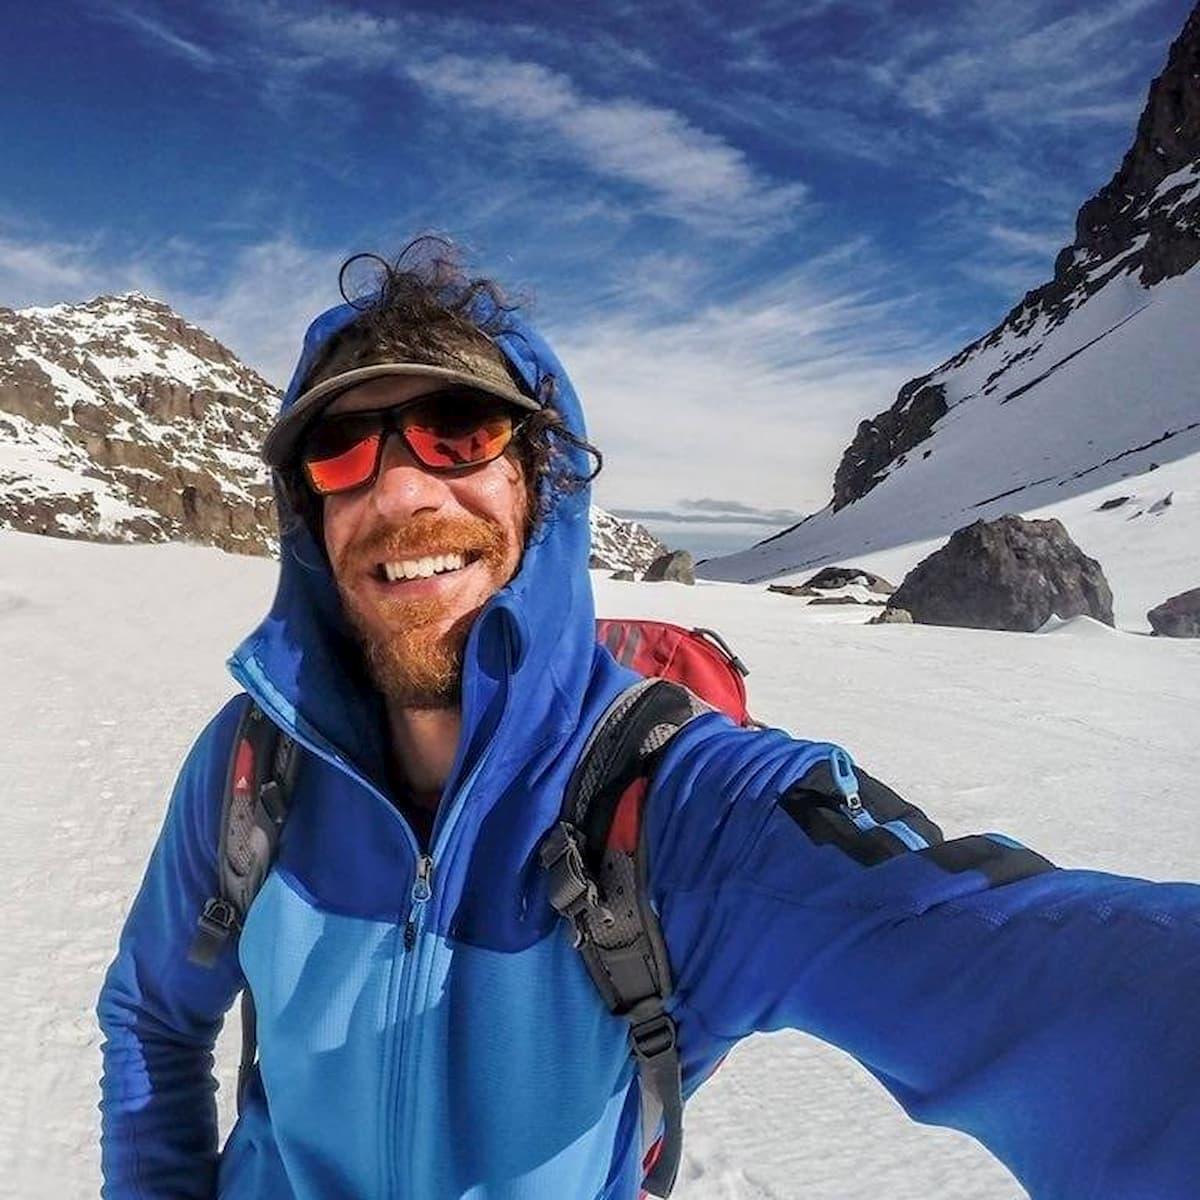 Valanga in Valtellina: Matteo Bernasconi, nota guida alpina, muore a 38 anni